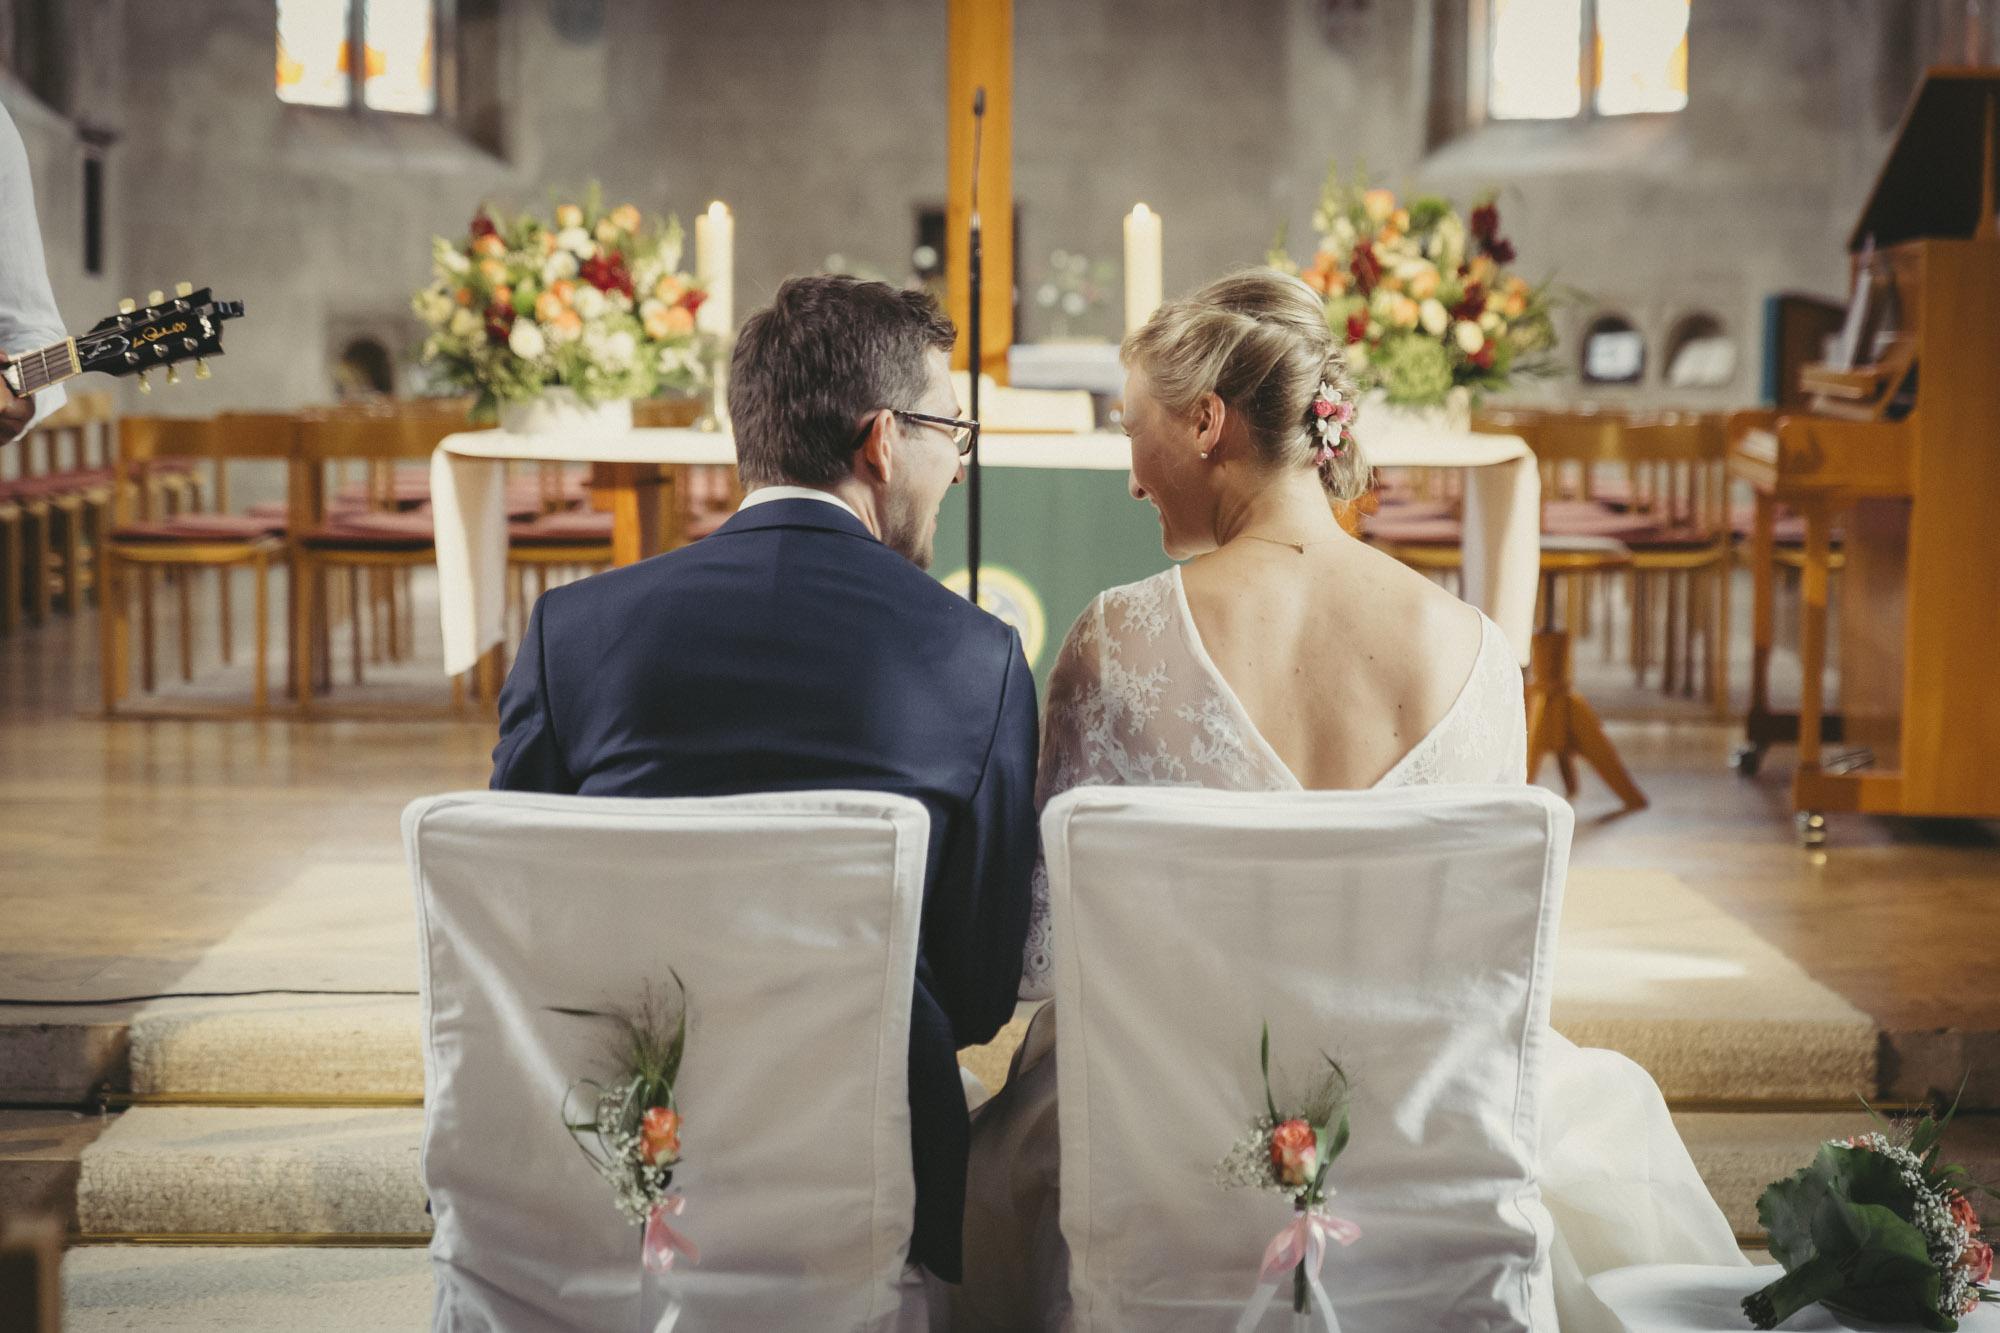 Hochzeitsfotografie-Tuebingen-Doro-Stefan-22